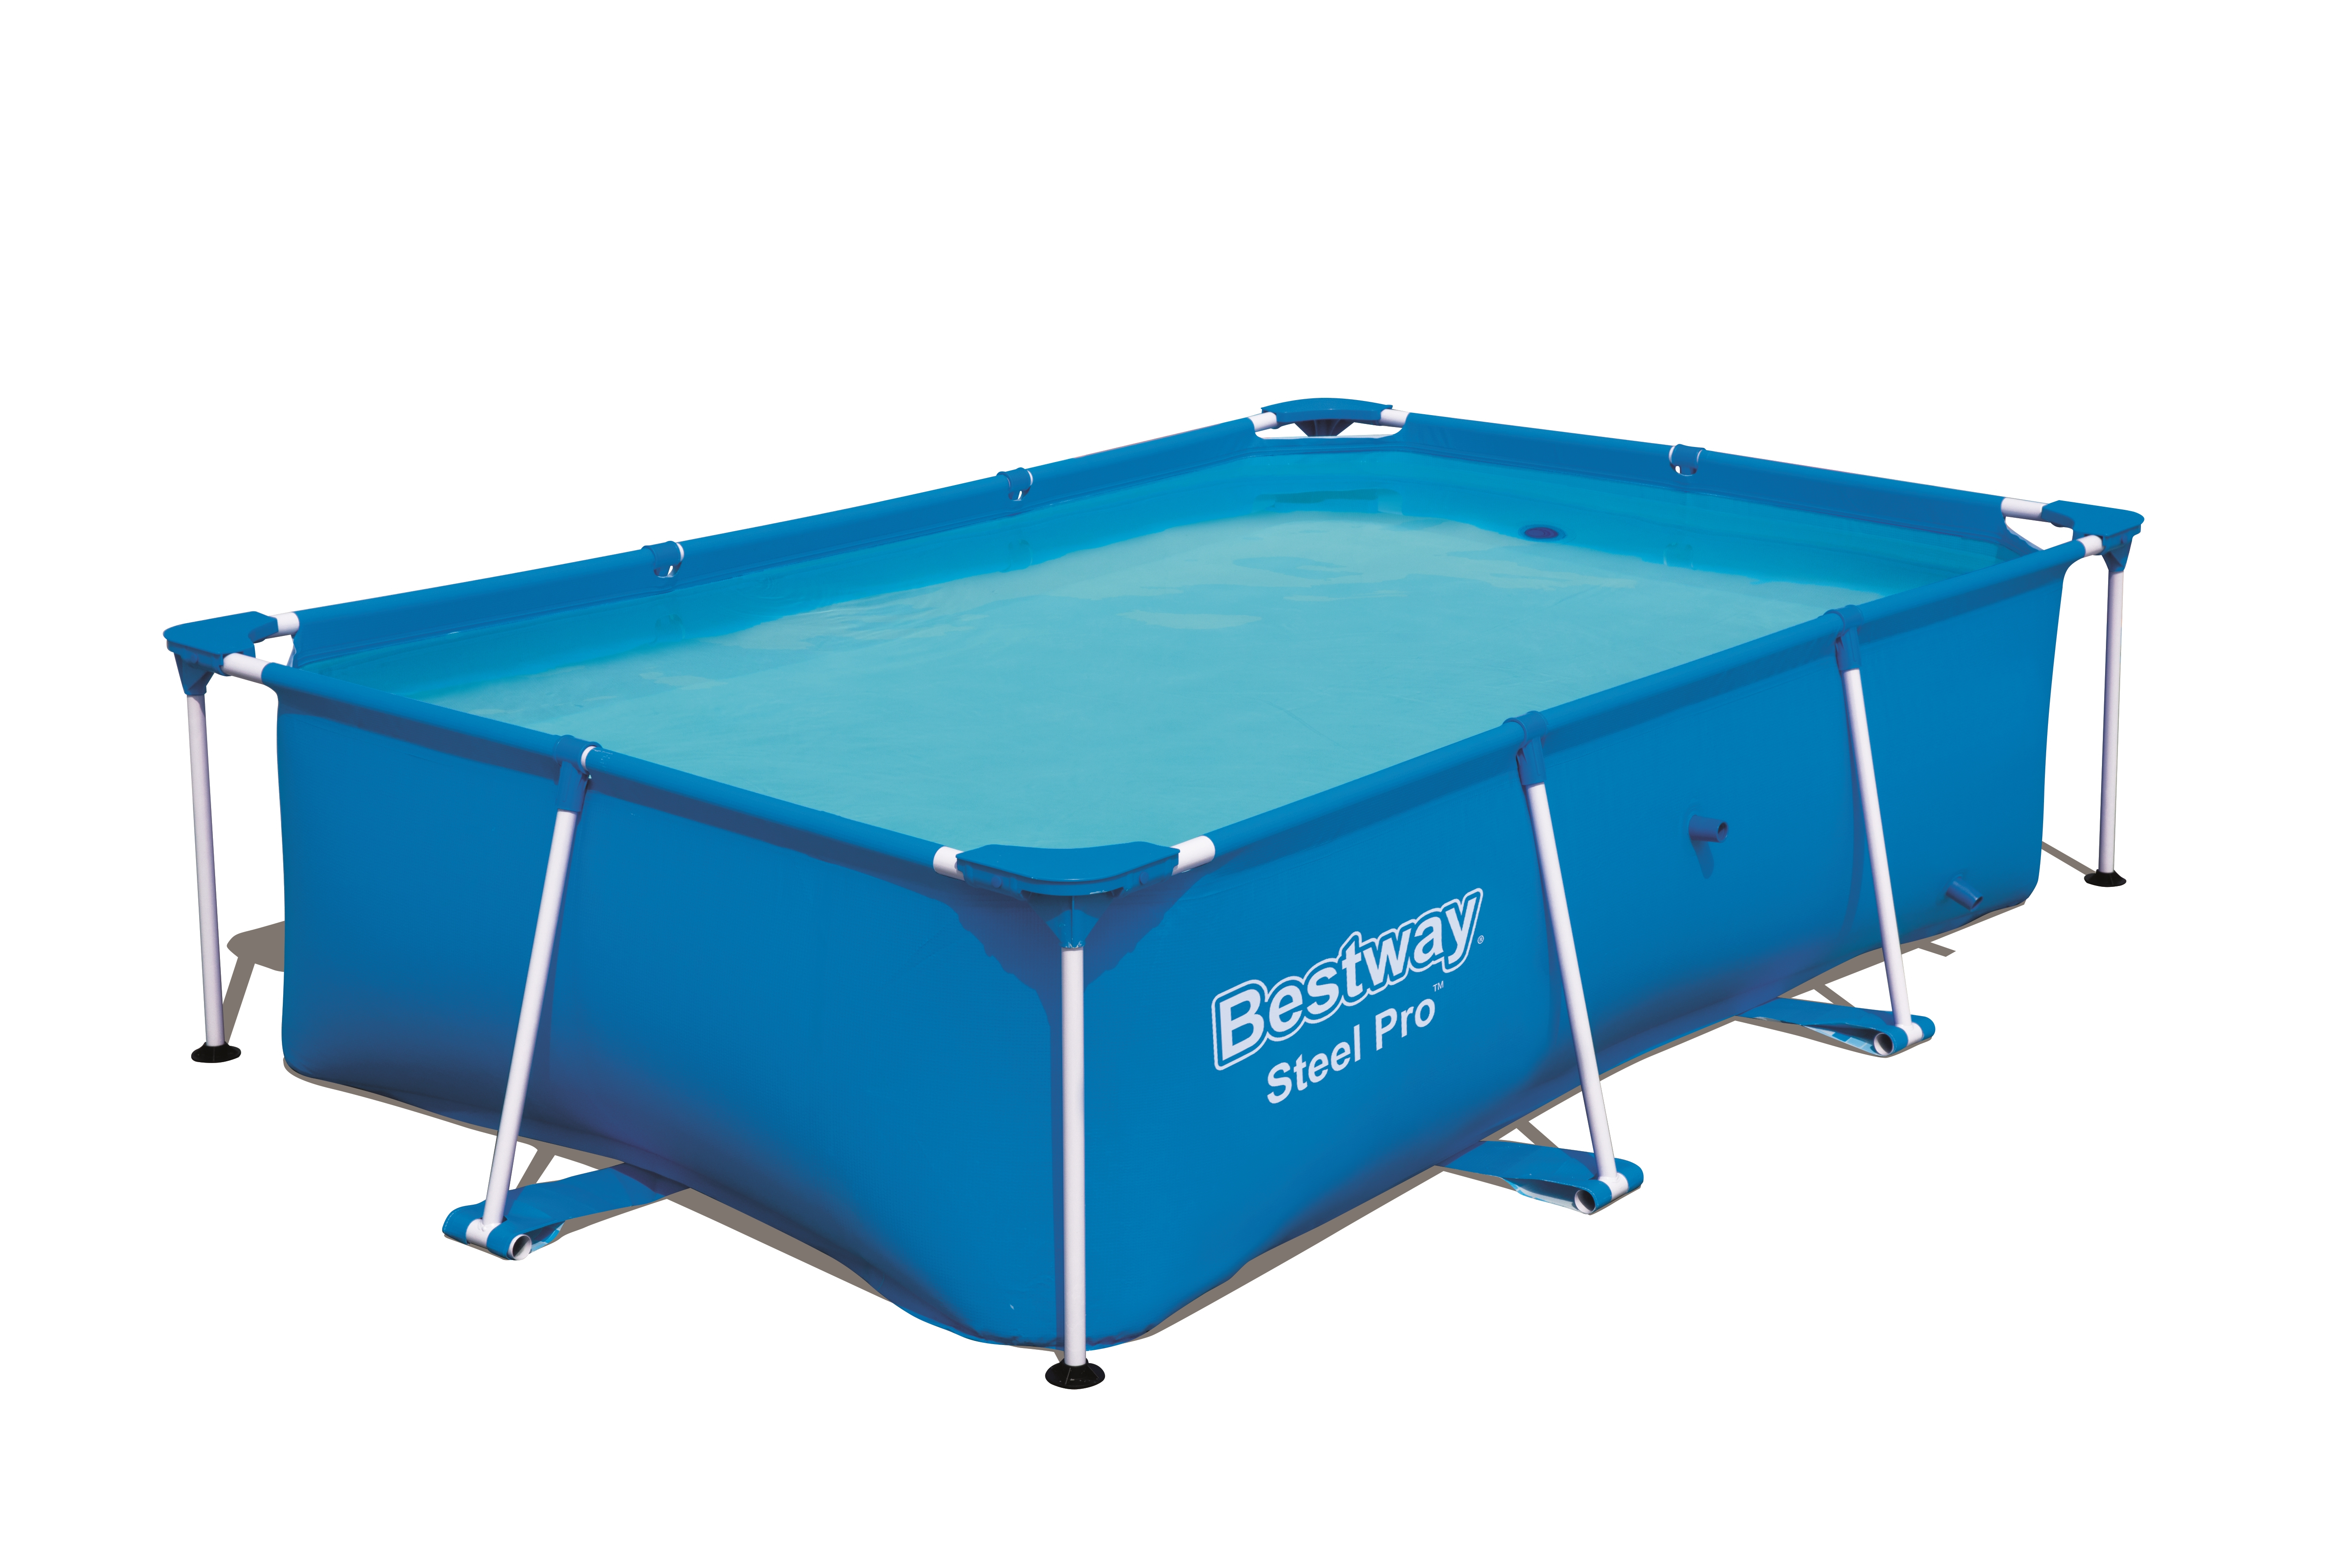 Lay-Z-Spa BW Steel Pro Pool 259x170x61| 56403